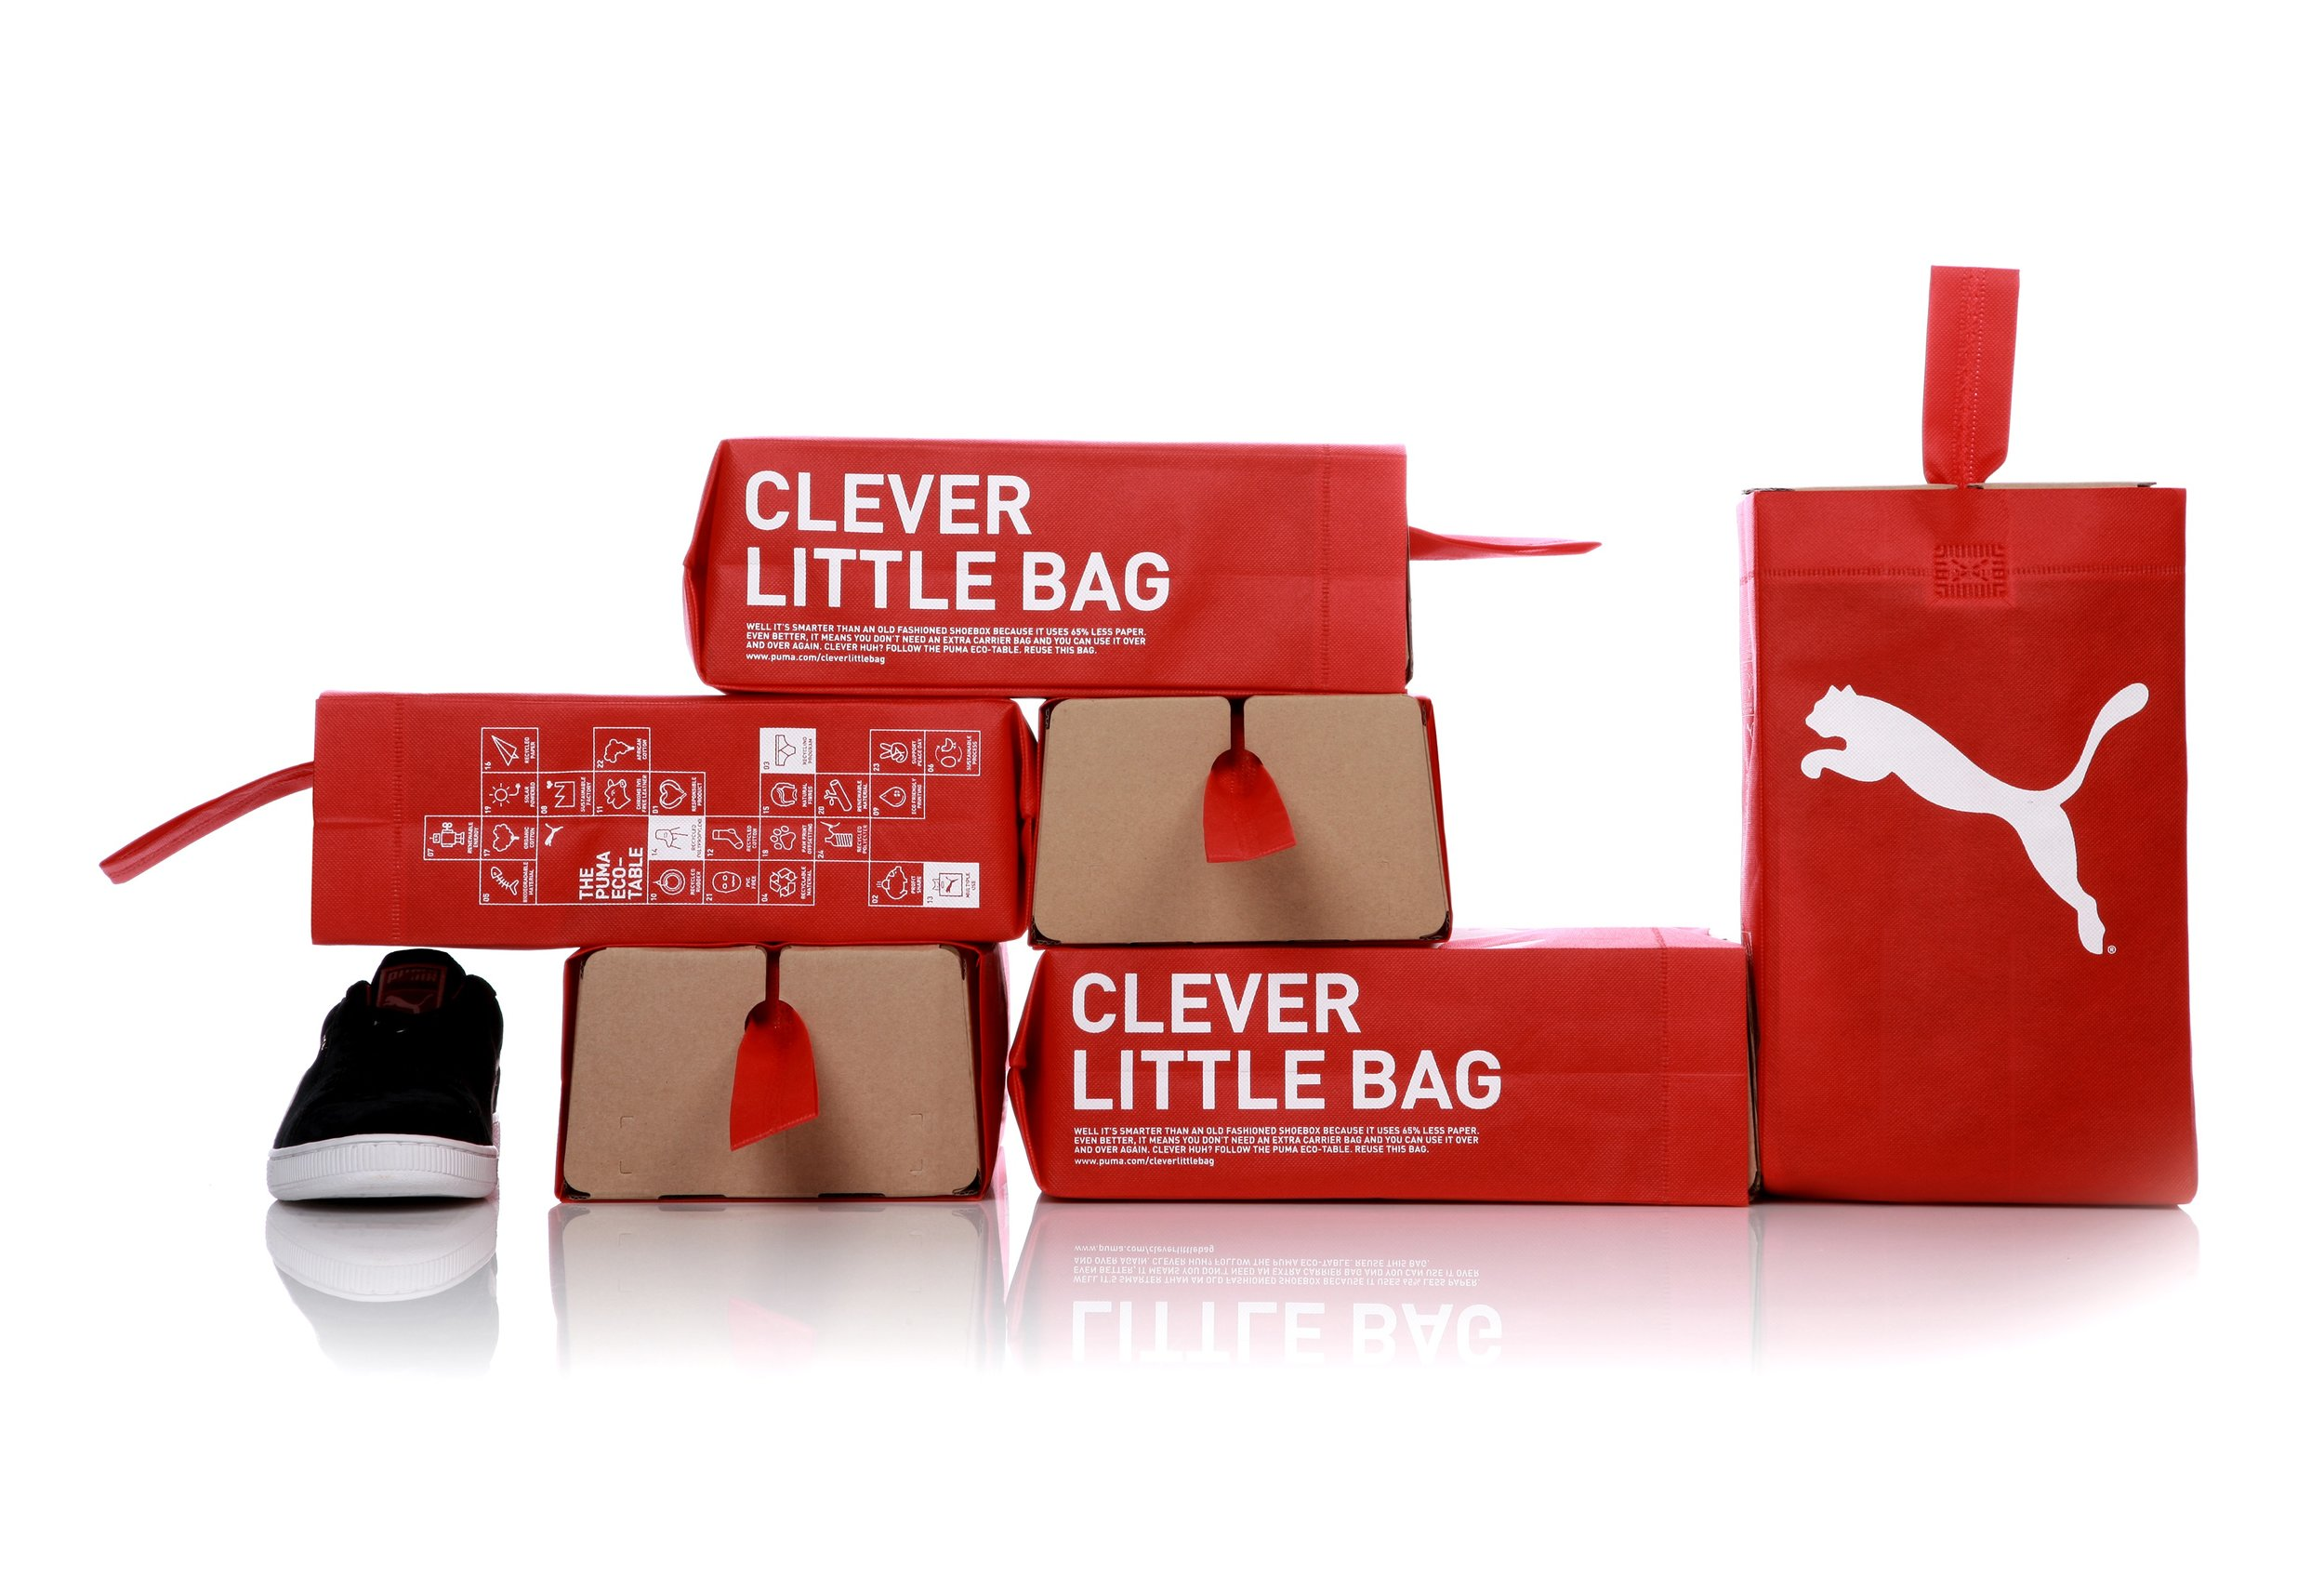 pumas-clever-little-bag1.jpg